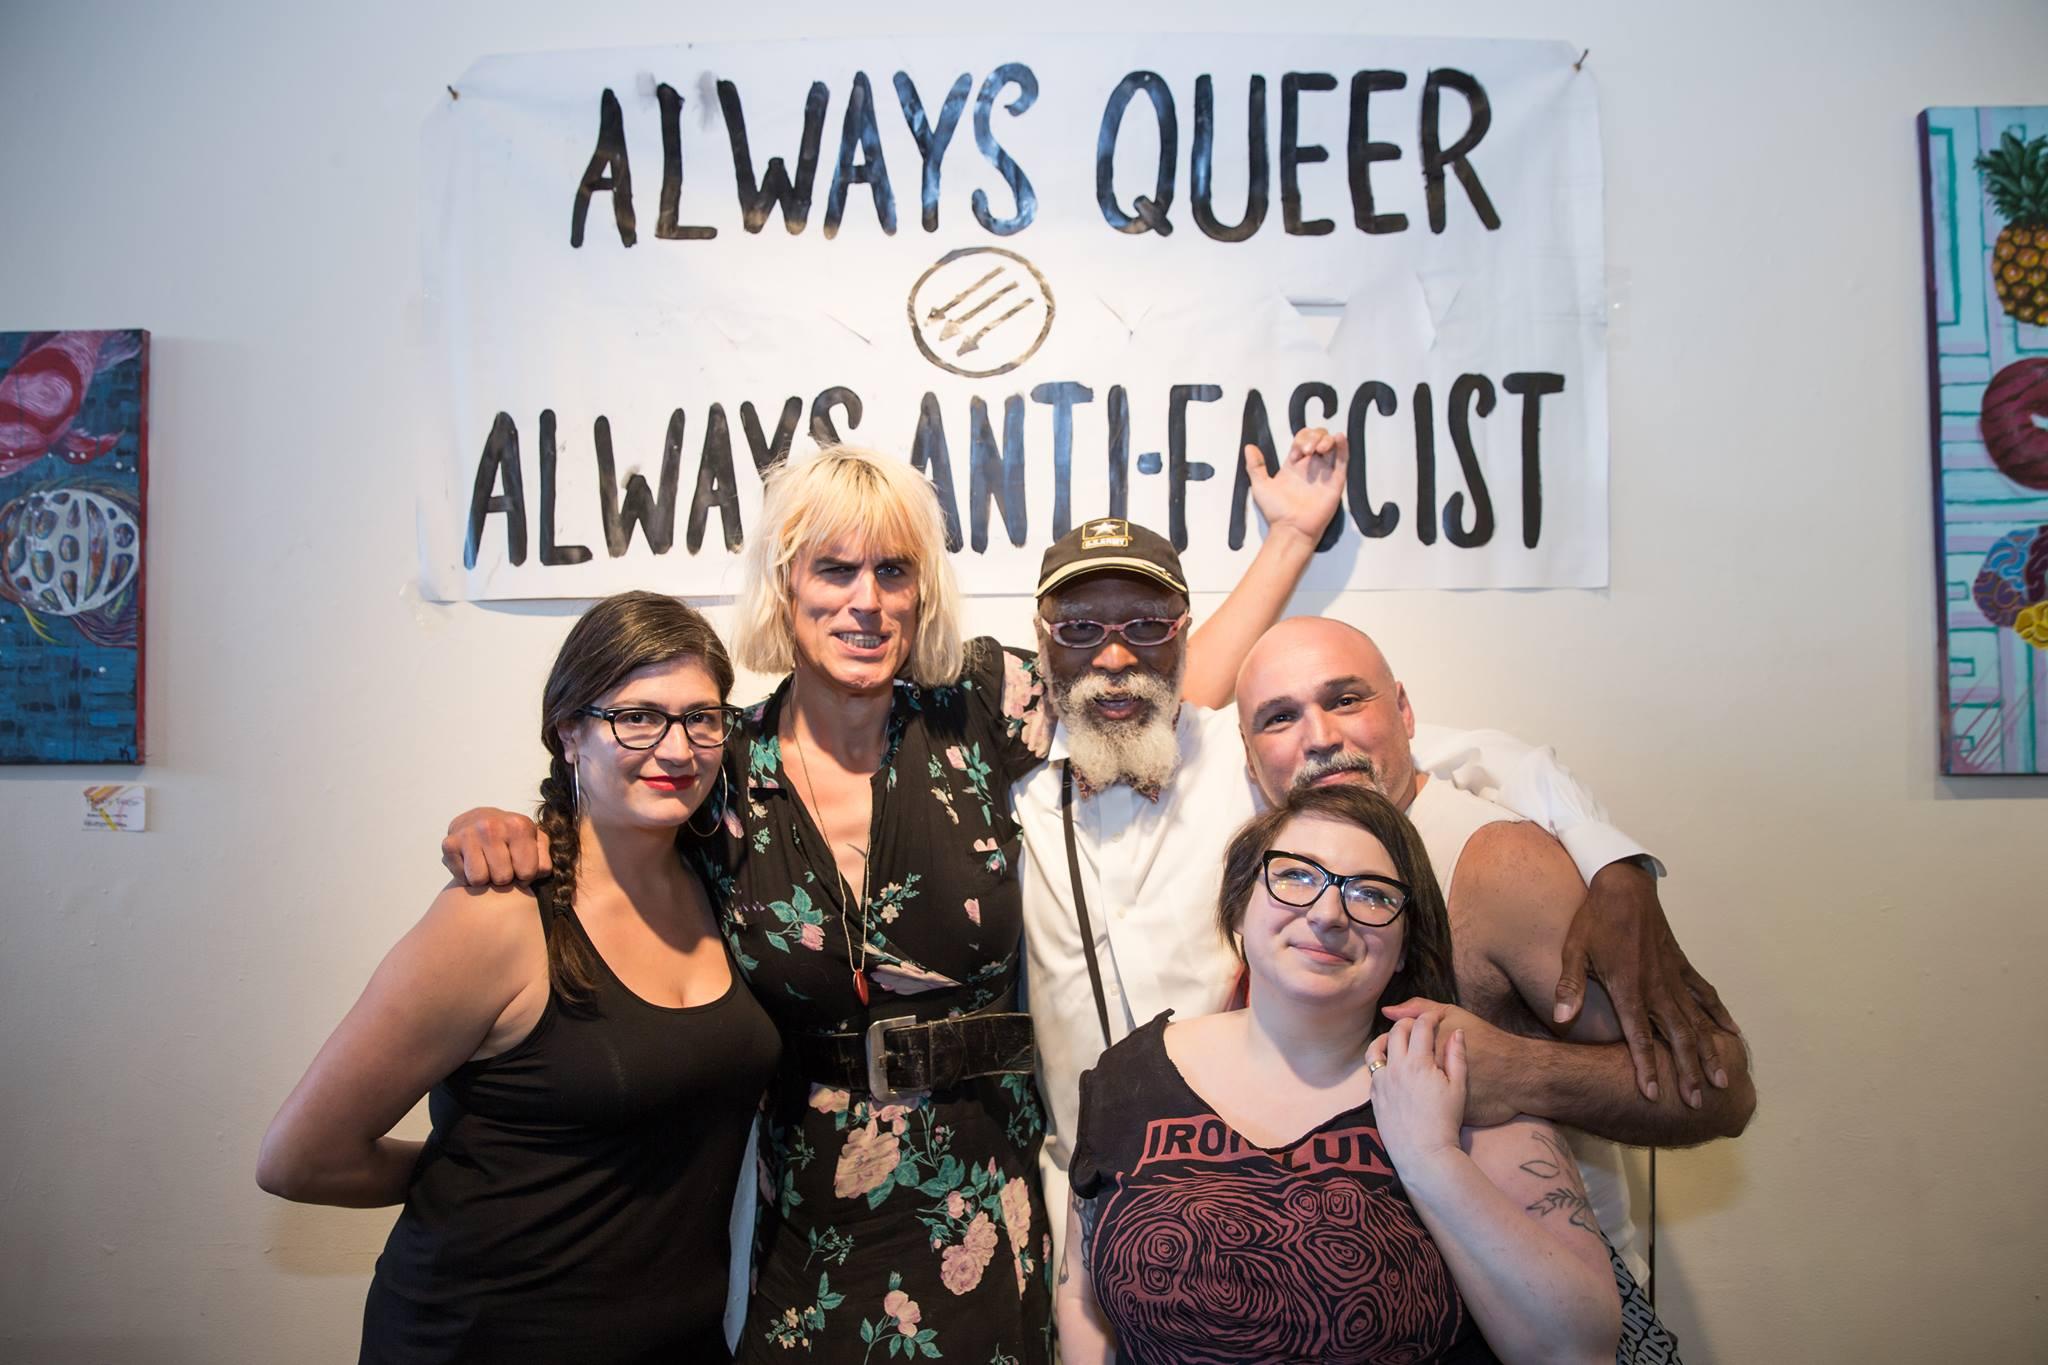 Left to right: Mariam Bastani, Jill Flanagan (who performs as Forced Into Femininity), Travis, Jes Skolnik, and Martin Sorrondeguy